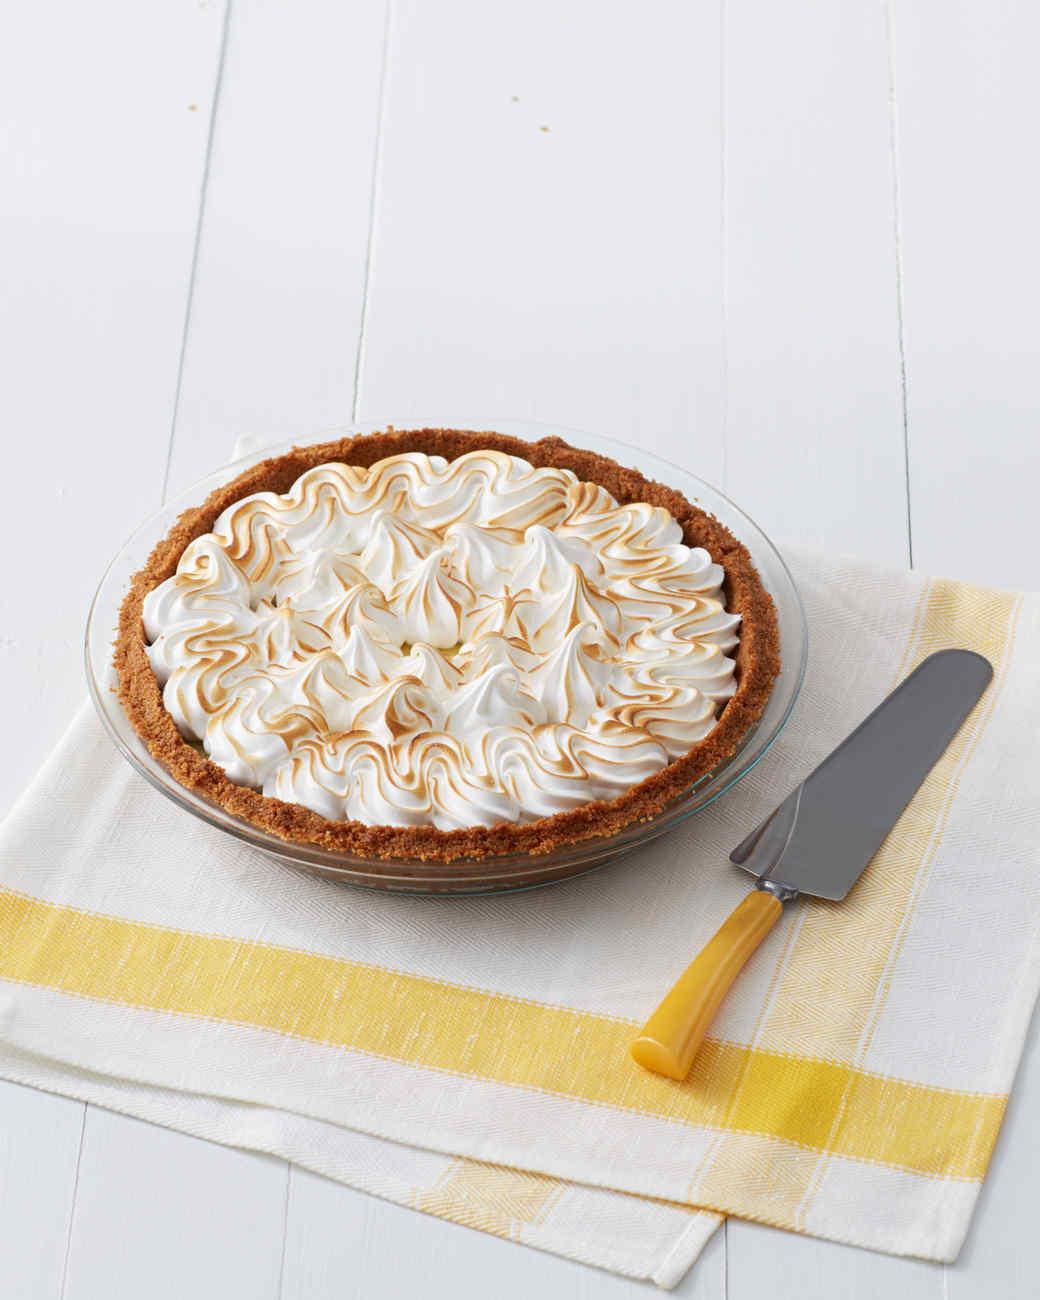 martha-bakes-key-lime-pie-101-d110936-0514.jpg